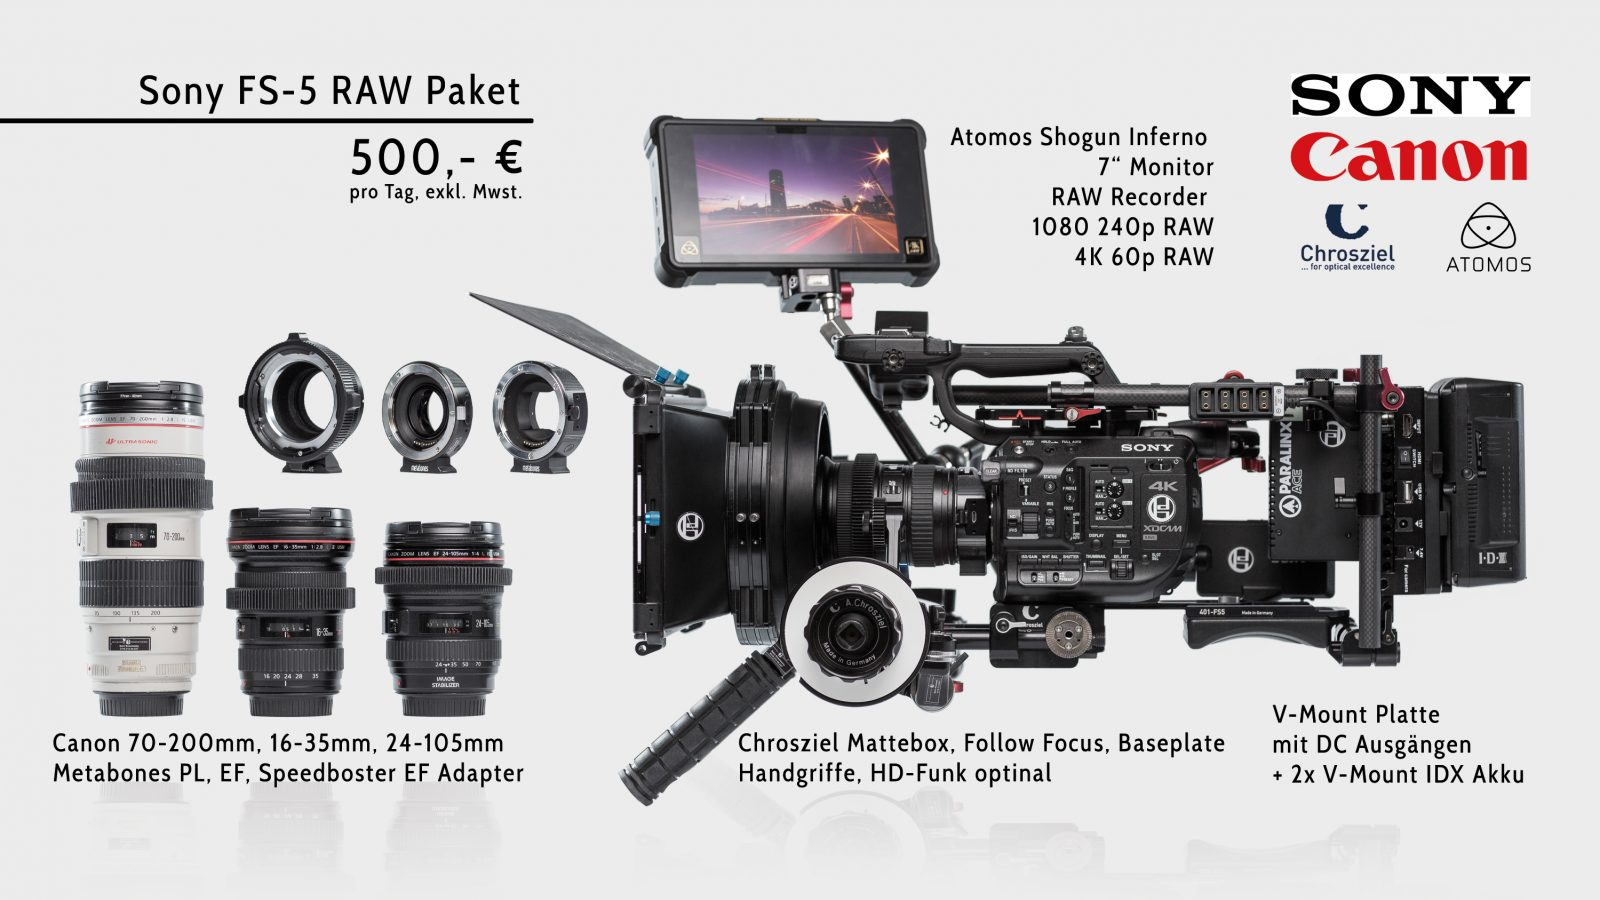 Sony FS-5 RAW Paket + Inferno